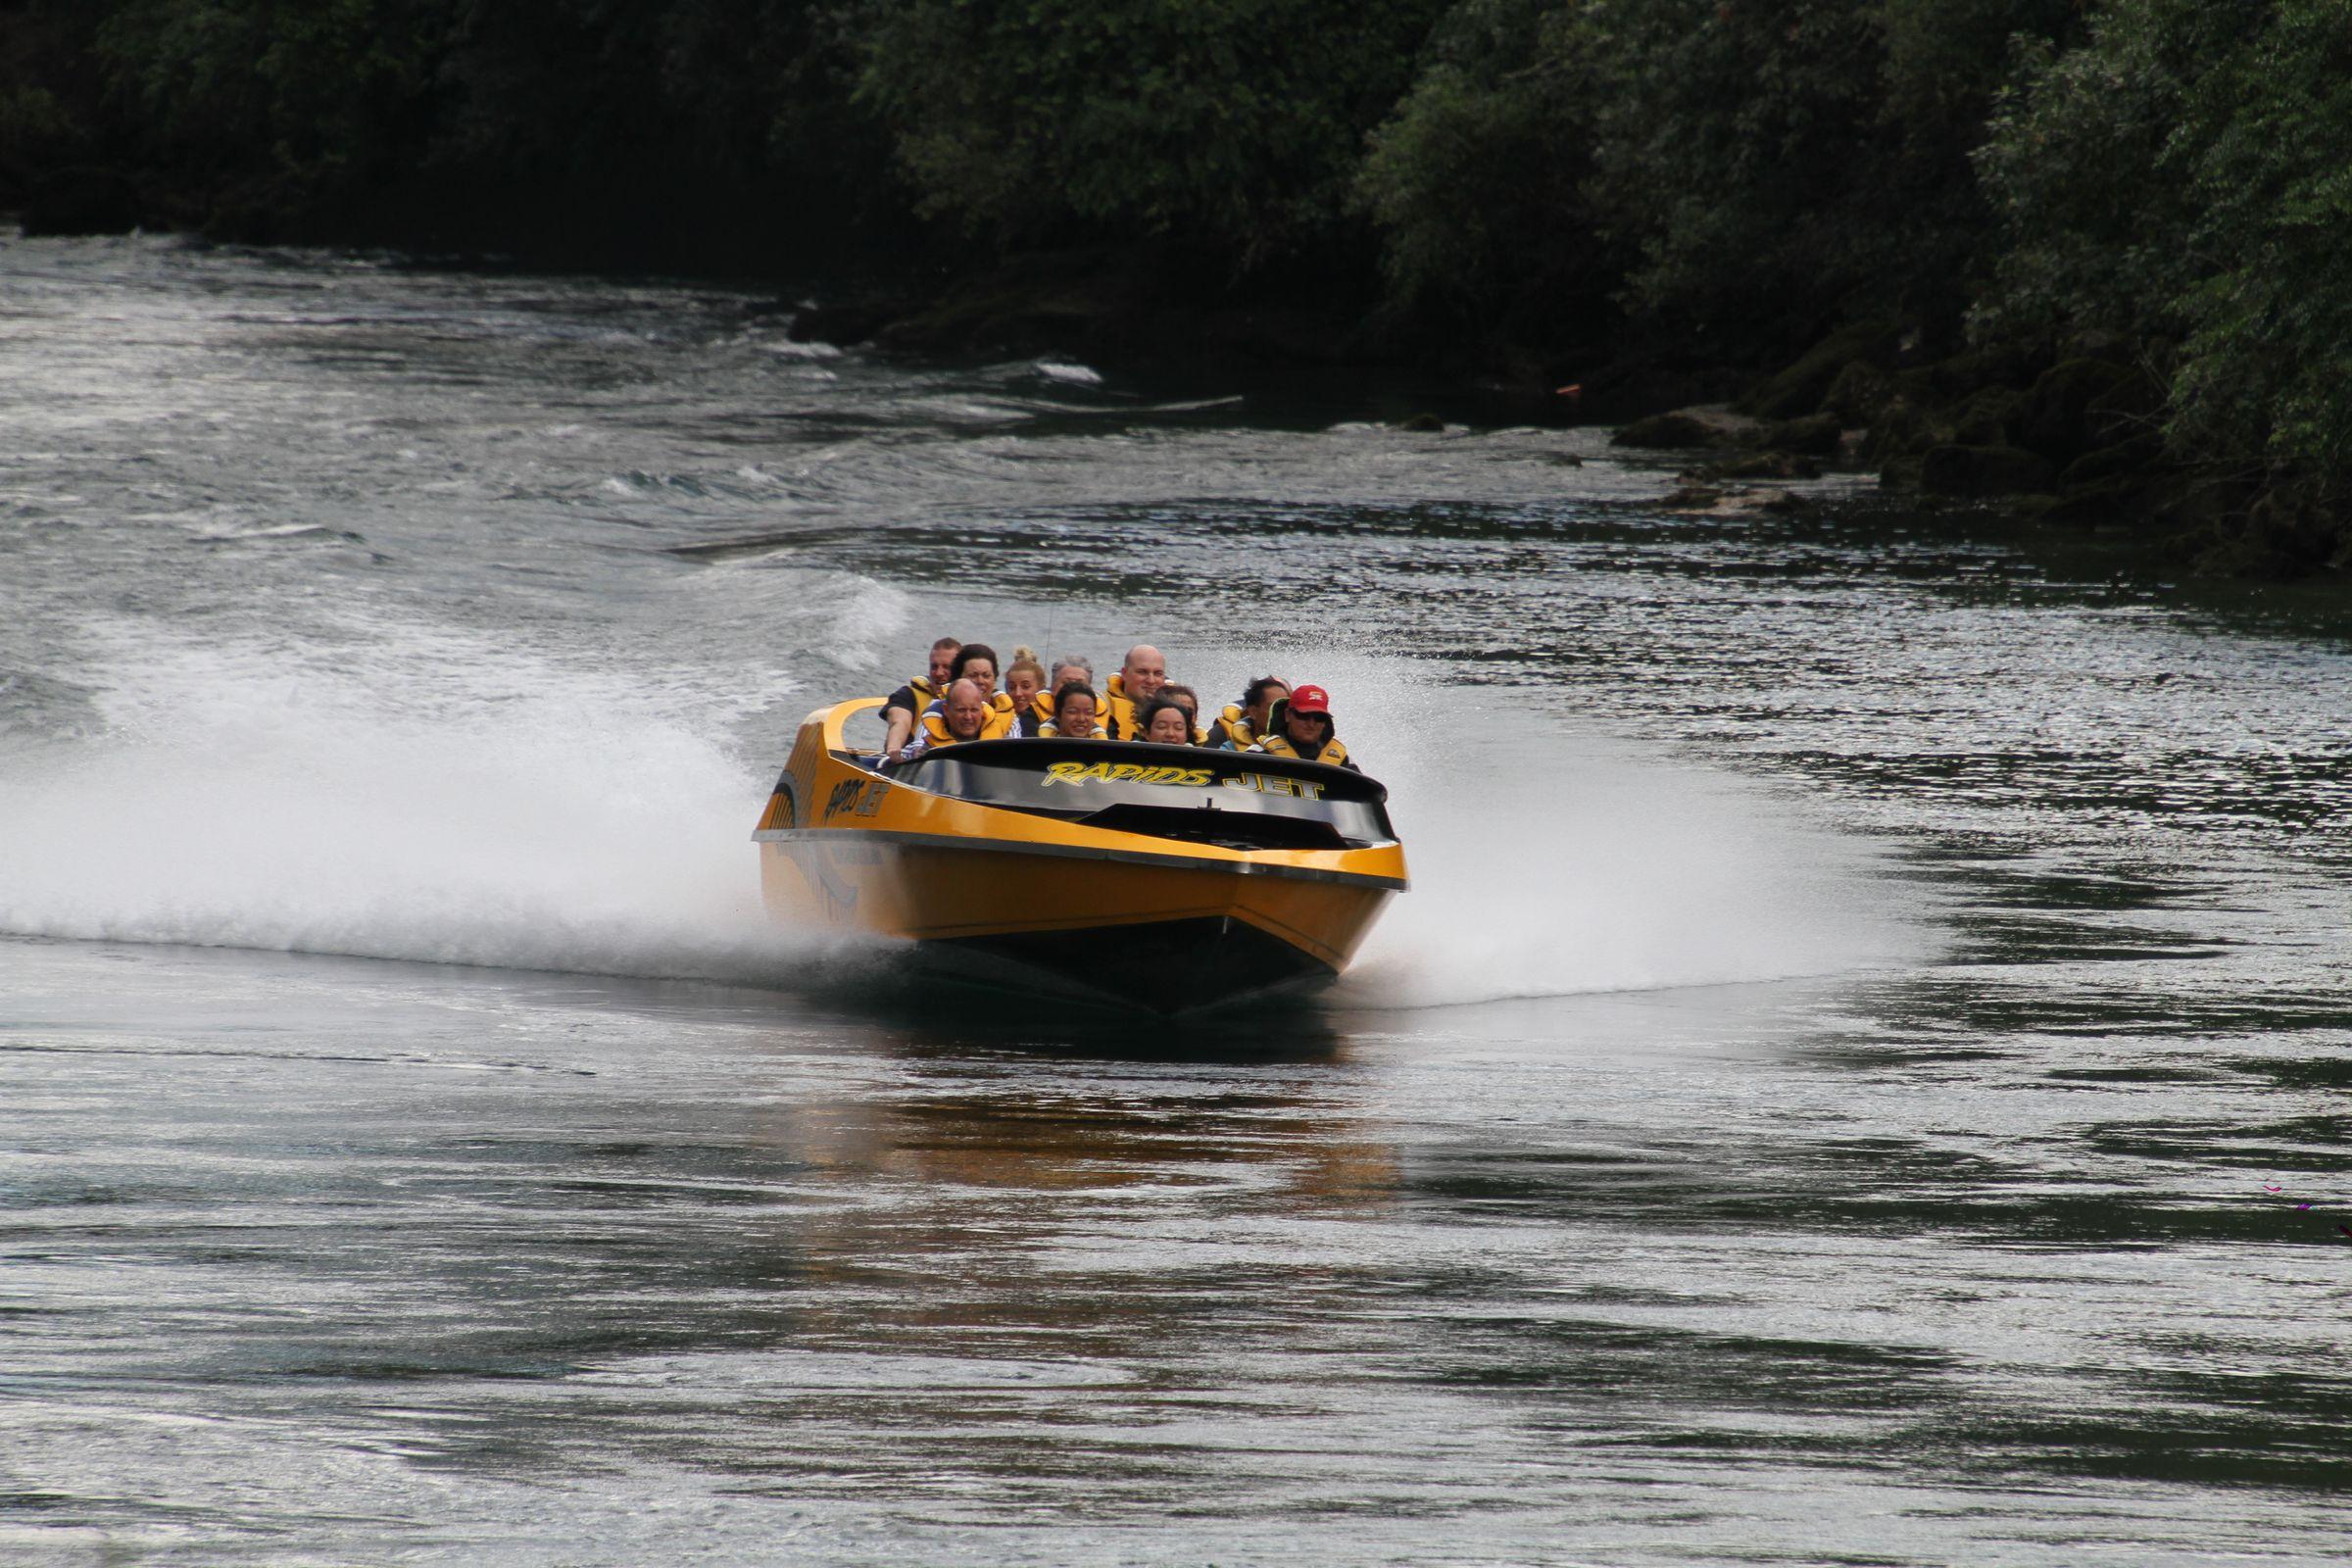 https://bubo.sk/uploads/galleries/5027/marekmeluch_novyzeland_jetboating-rapidjets_vysledok.jpg